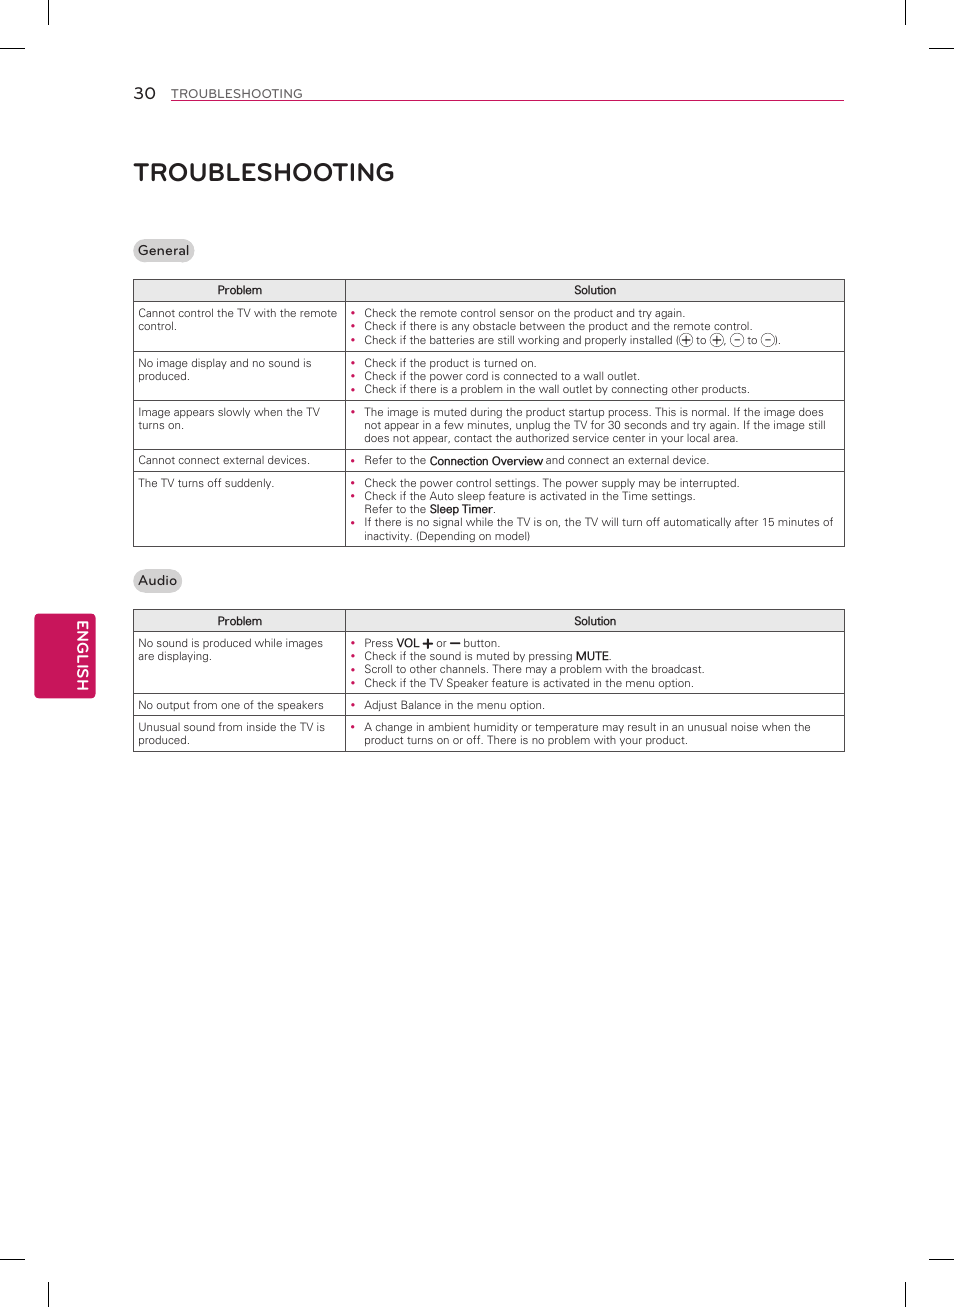 Troubleshooting, English | LG 50LN5100 User Manual | Page 30 / 48